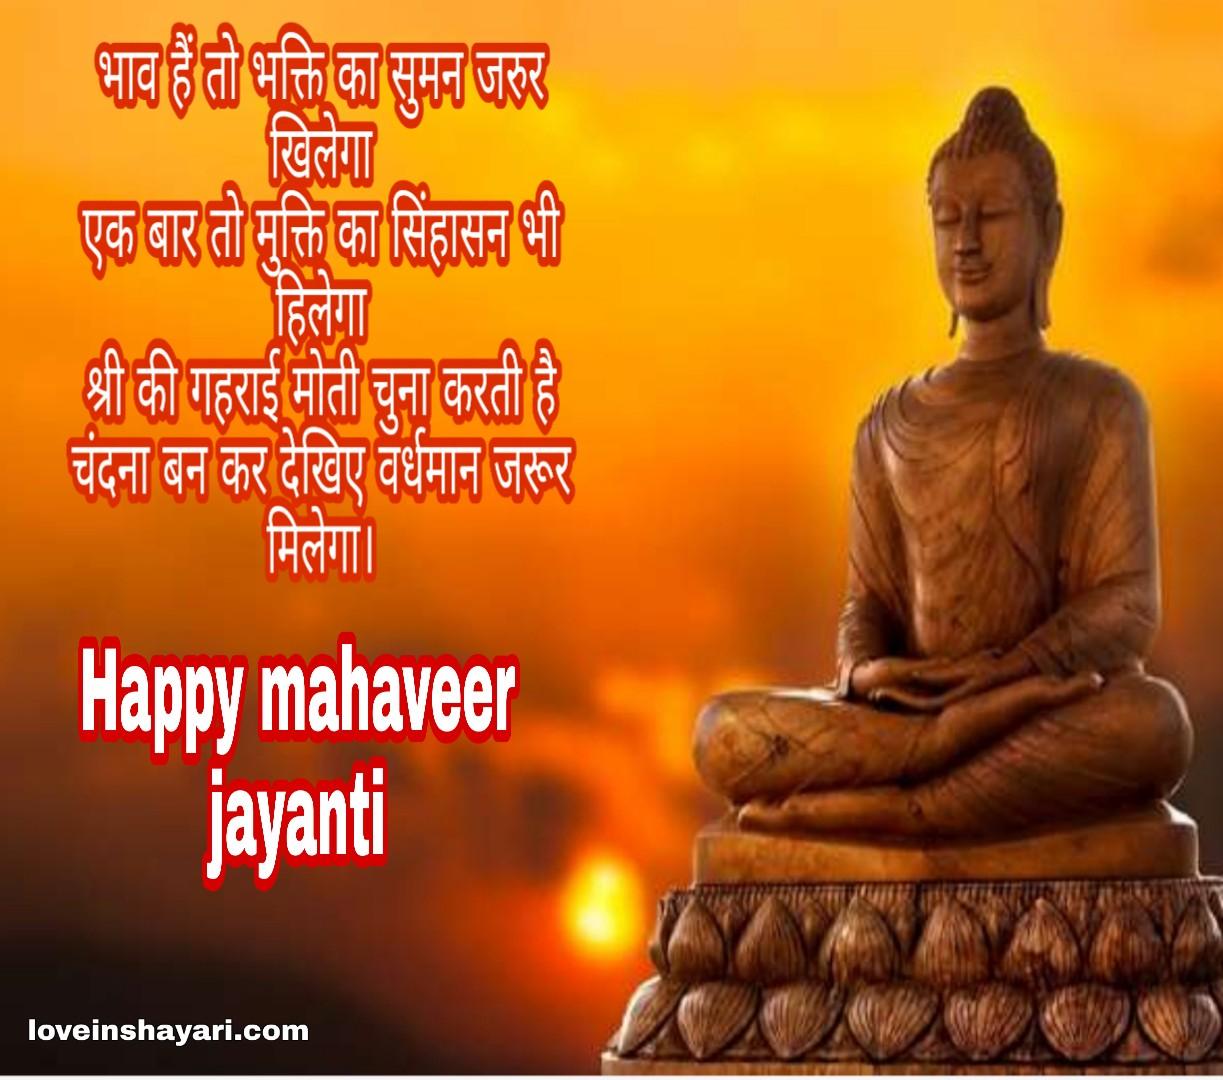 Mahaveer jayanti wishes shayari quotes message